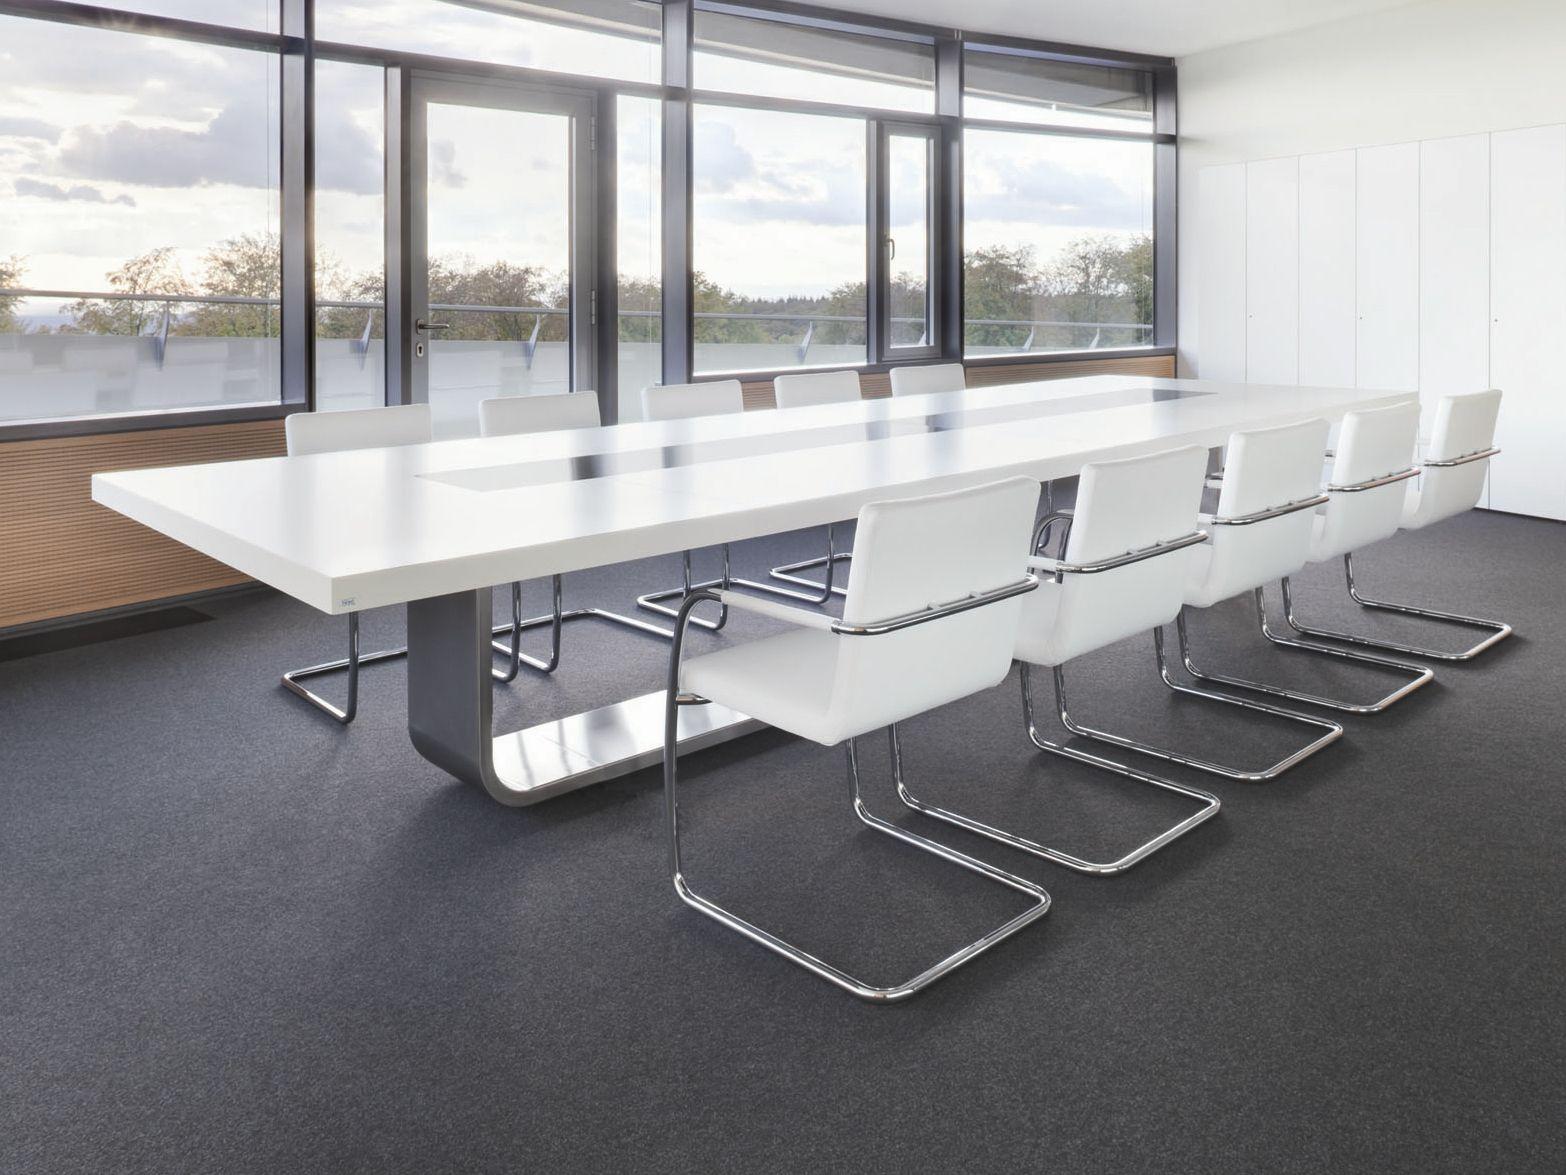 S8000 mesa de reuni n by thonet dise o hadi teherani for Besprechungstisch design